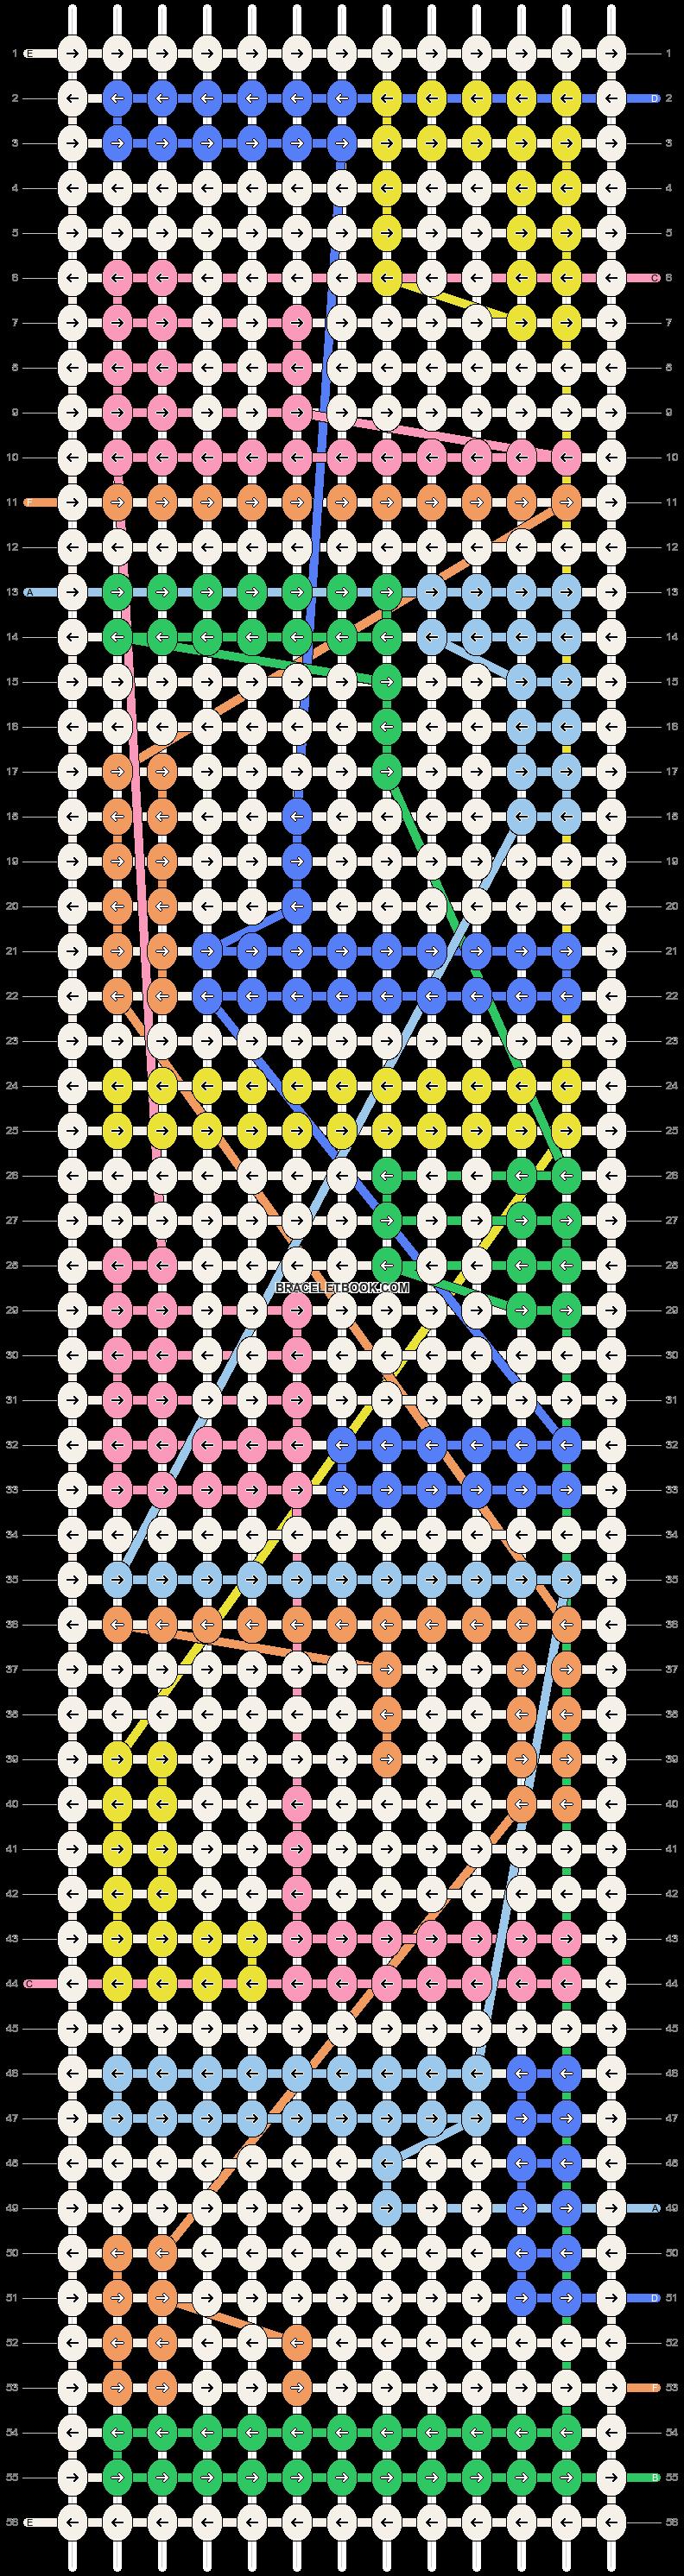 Alpha pattern #47030 pattern